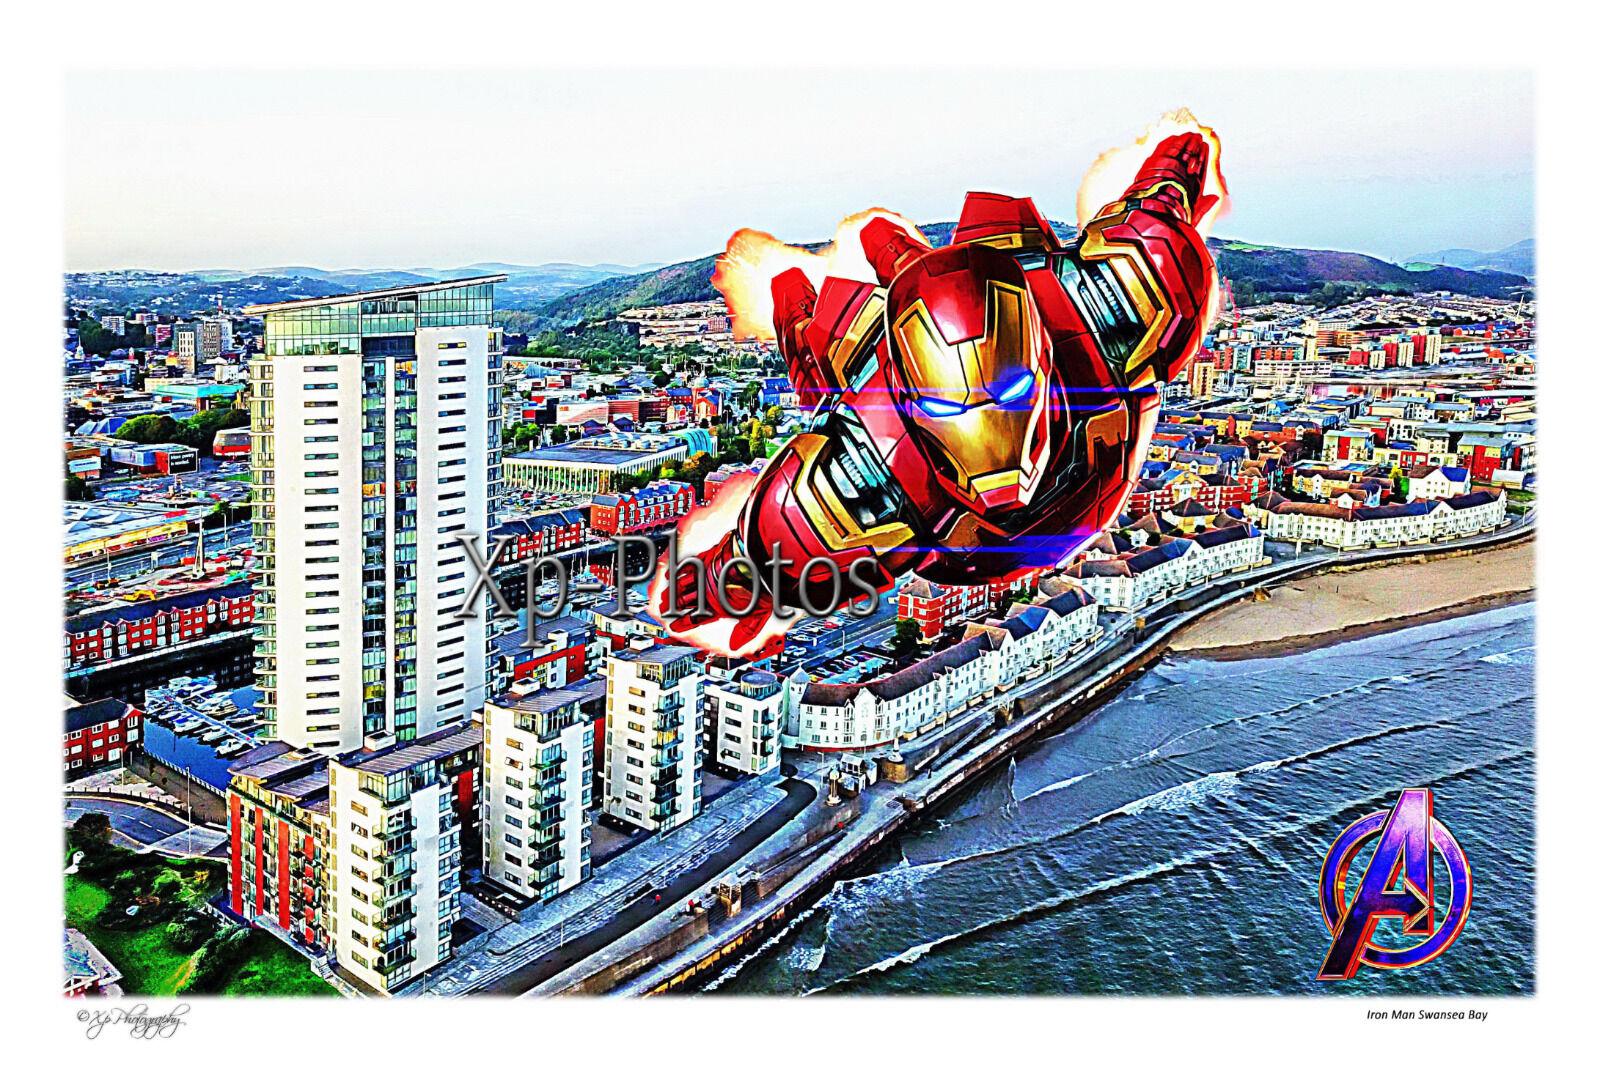 Iron Man Swansea Bay